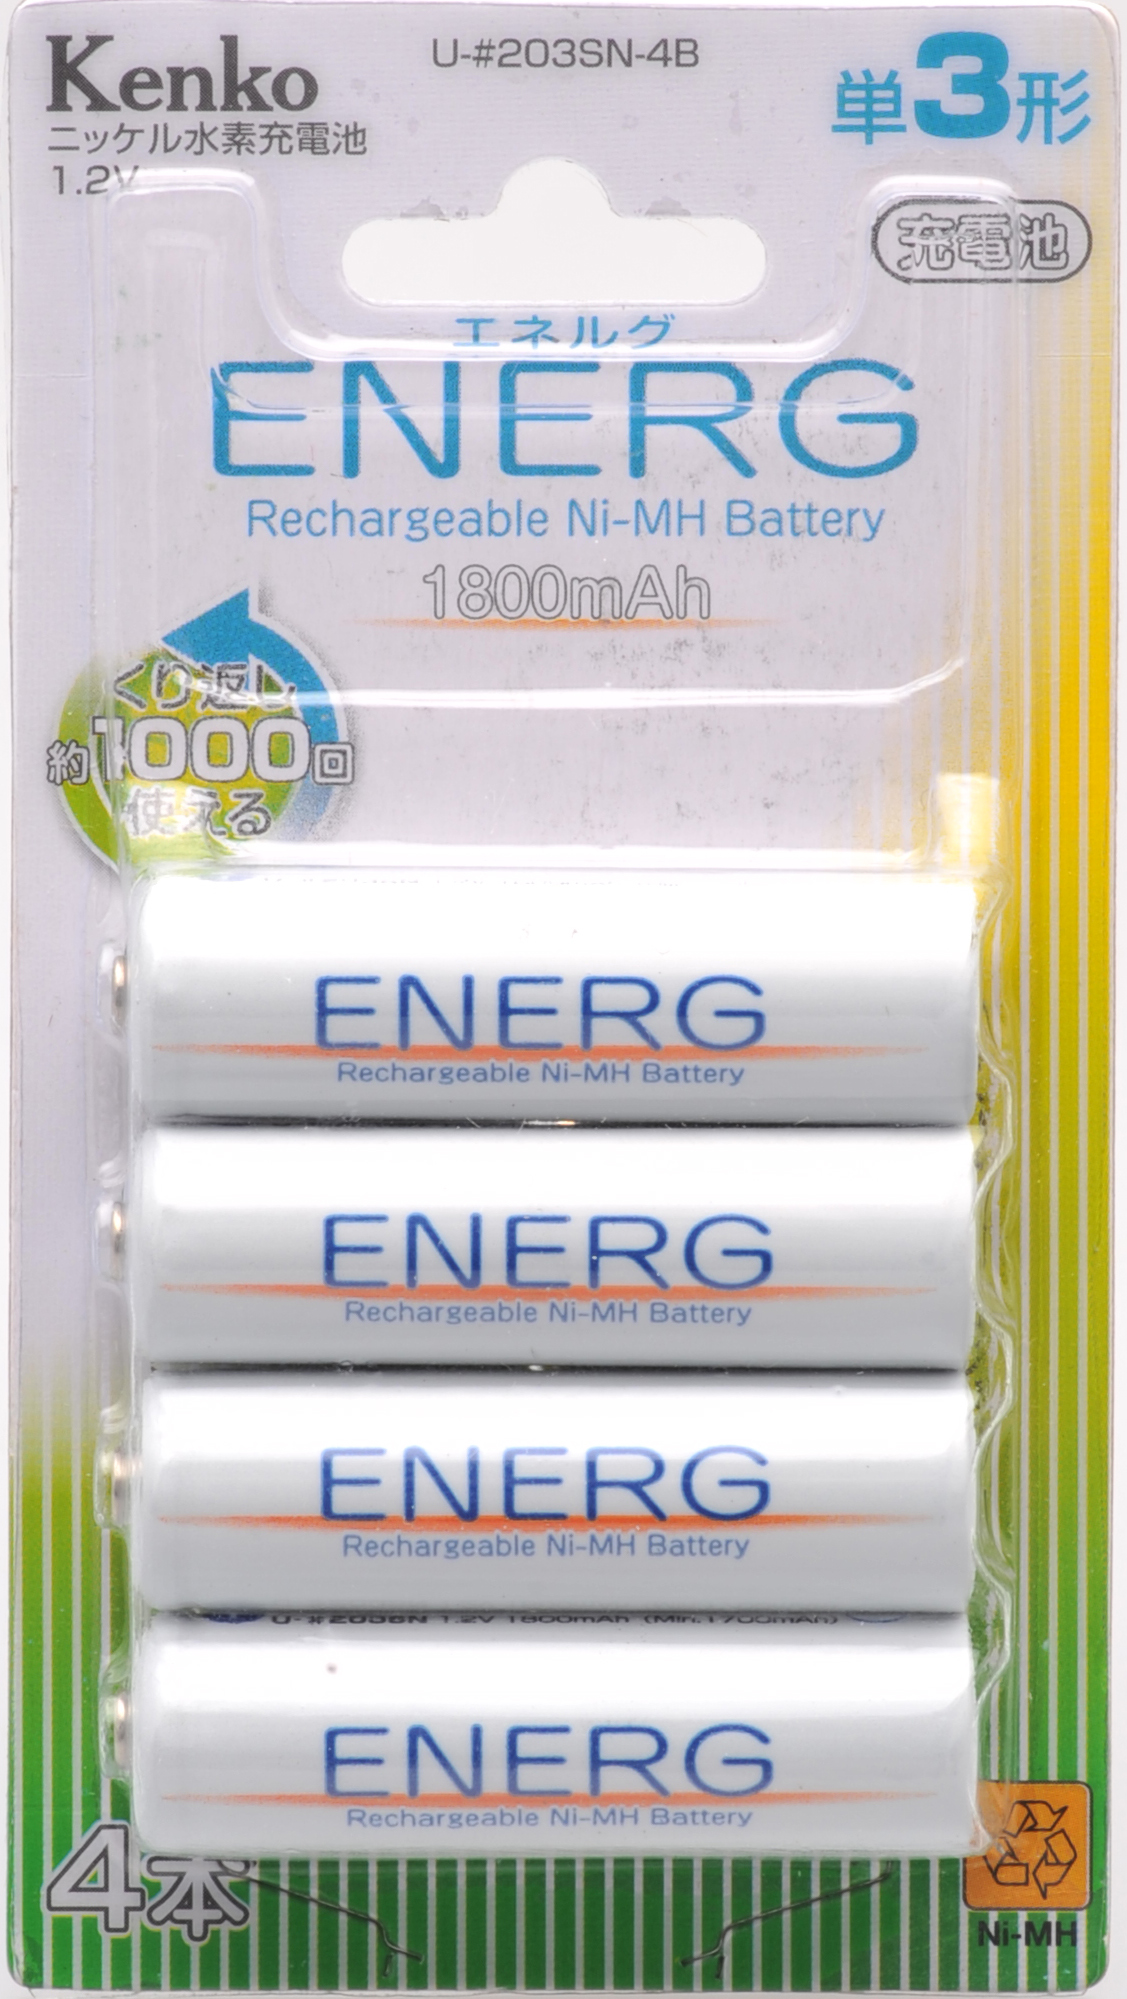 ENERG U-#203SN-4B